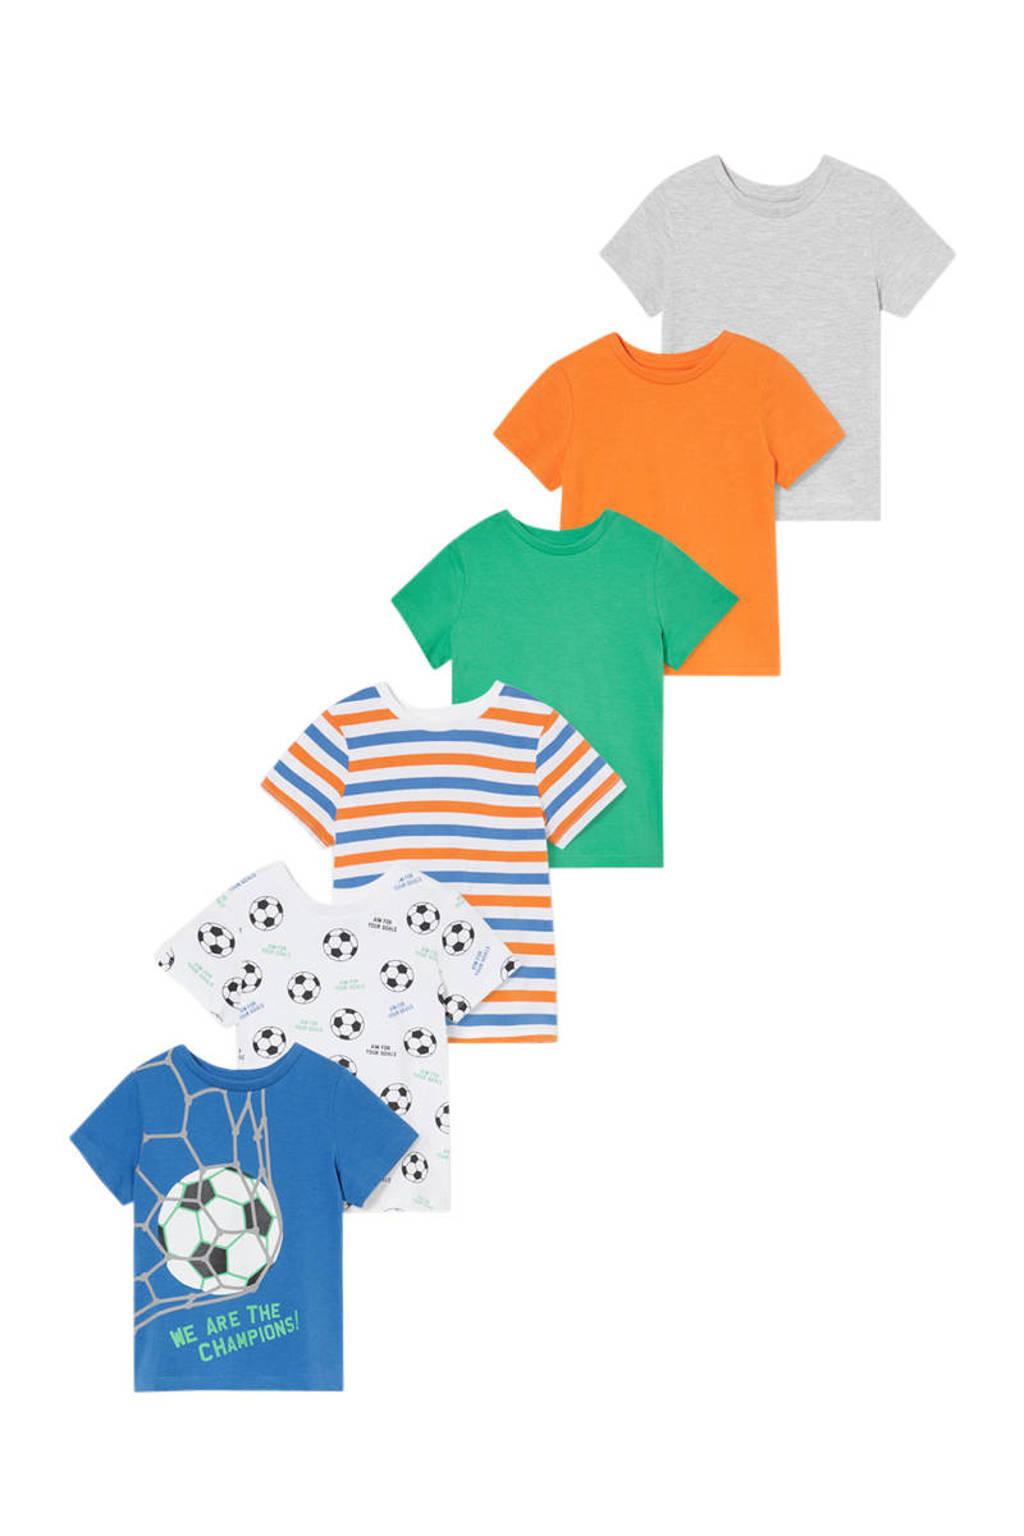 C&A Tough Team T-shirt - set van 6 multi, Blauw/wit/rood/groen/oranje/grijs